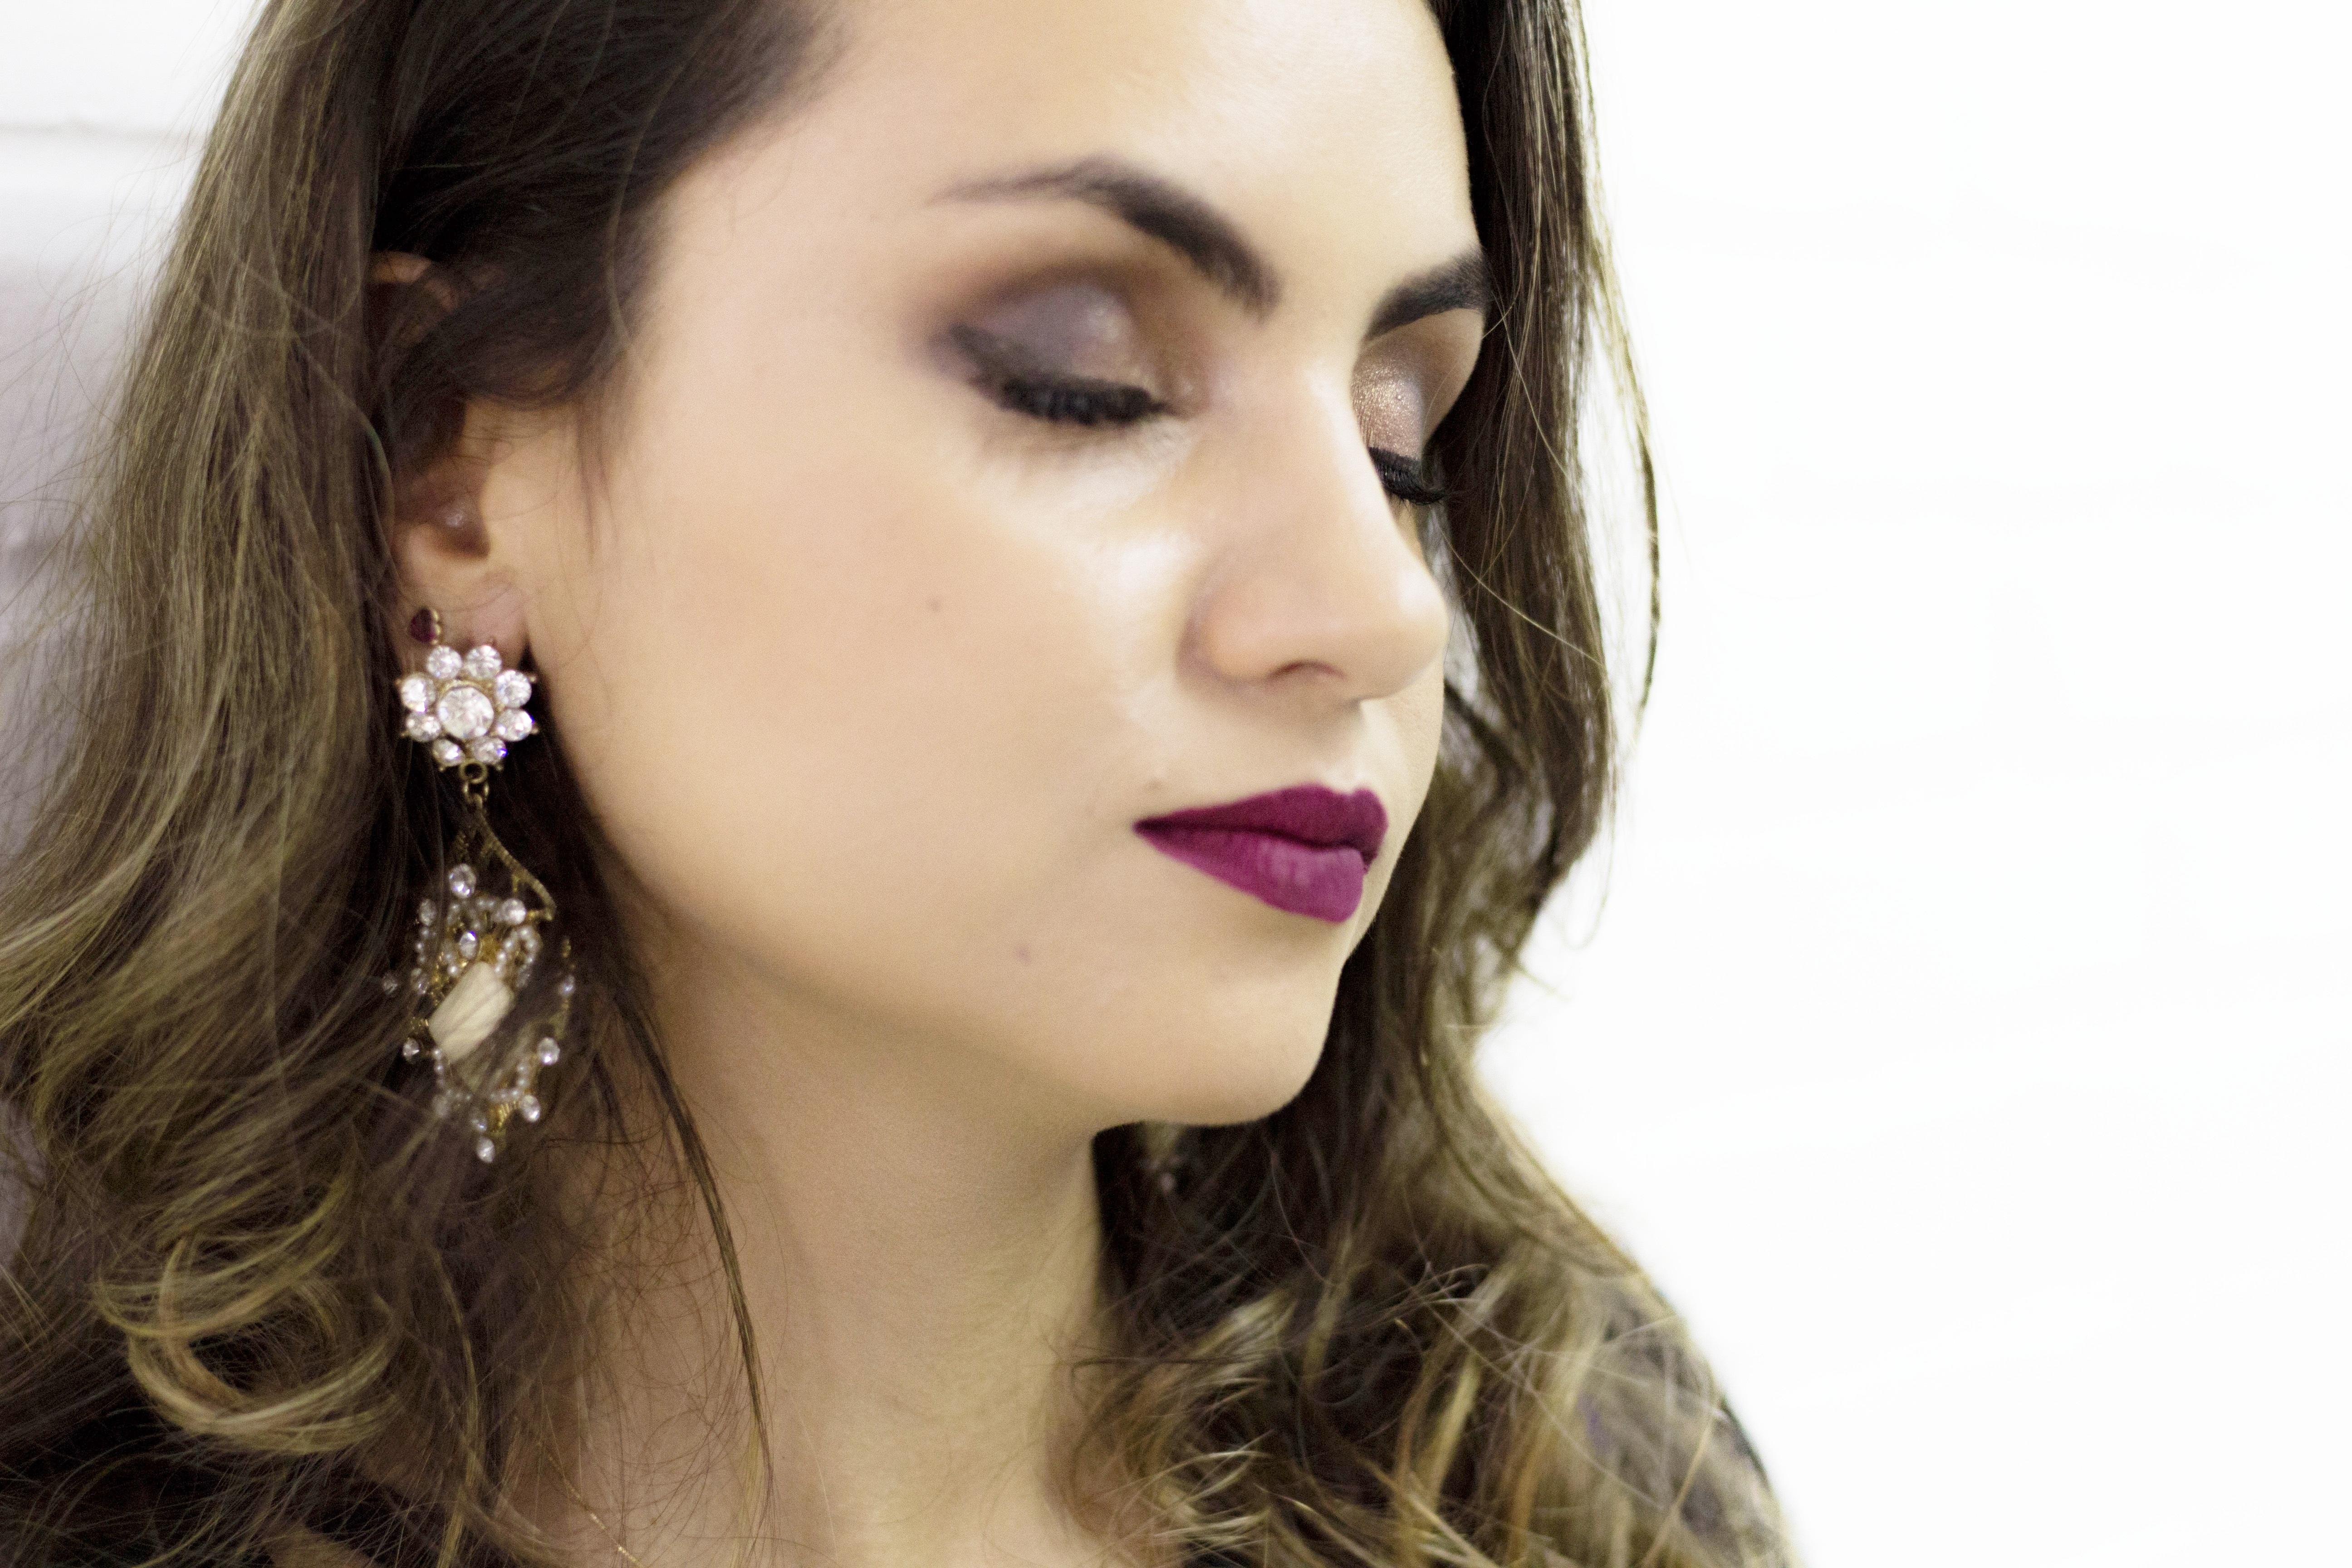 IMG_2044 Look da Ka: Saia Lápis + Kimono e makeup